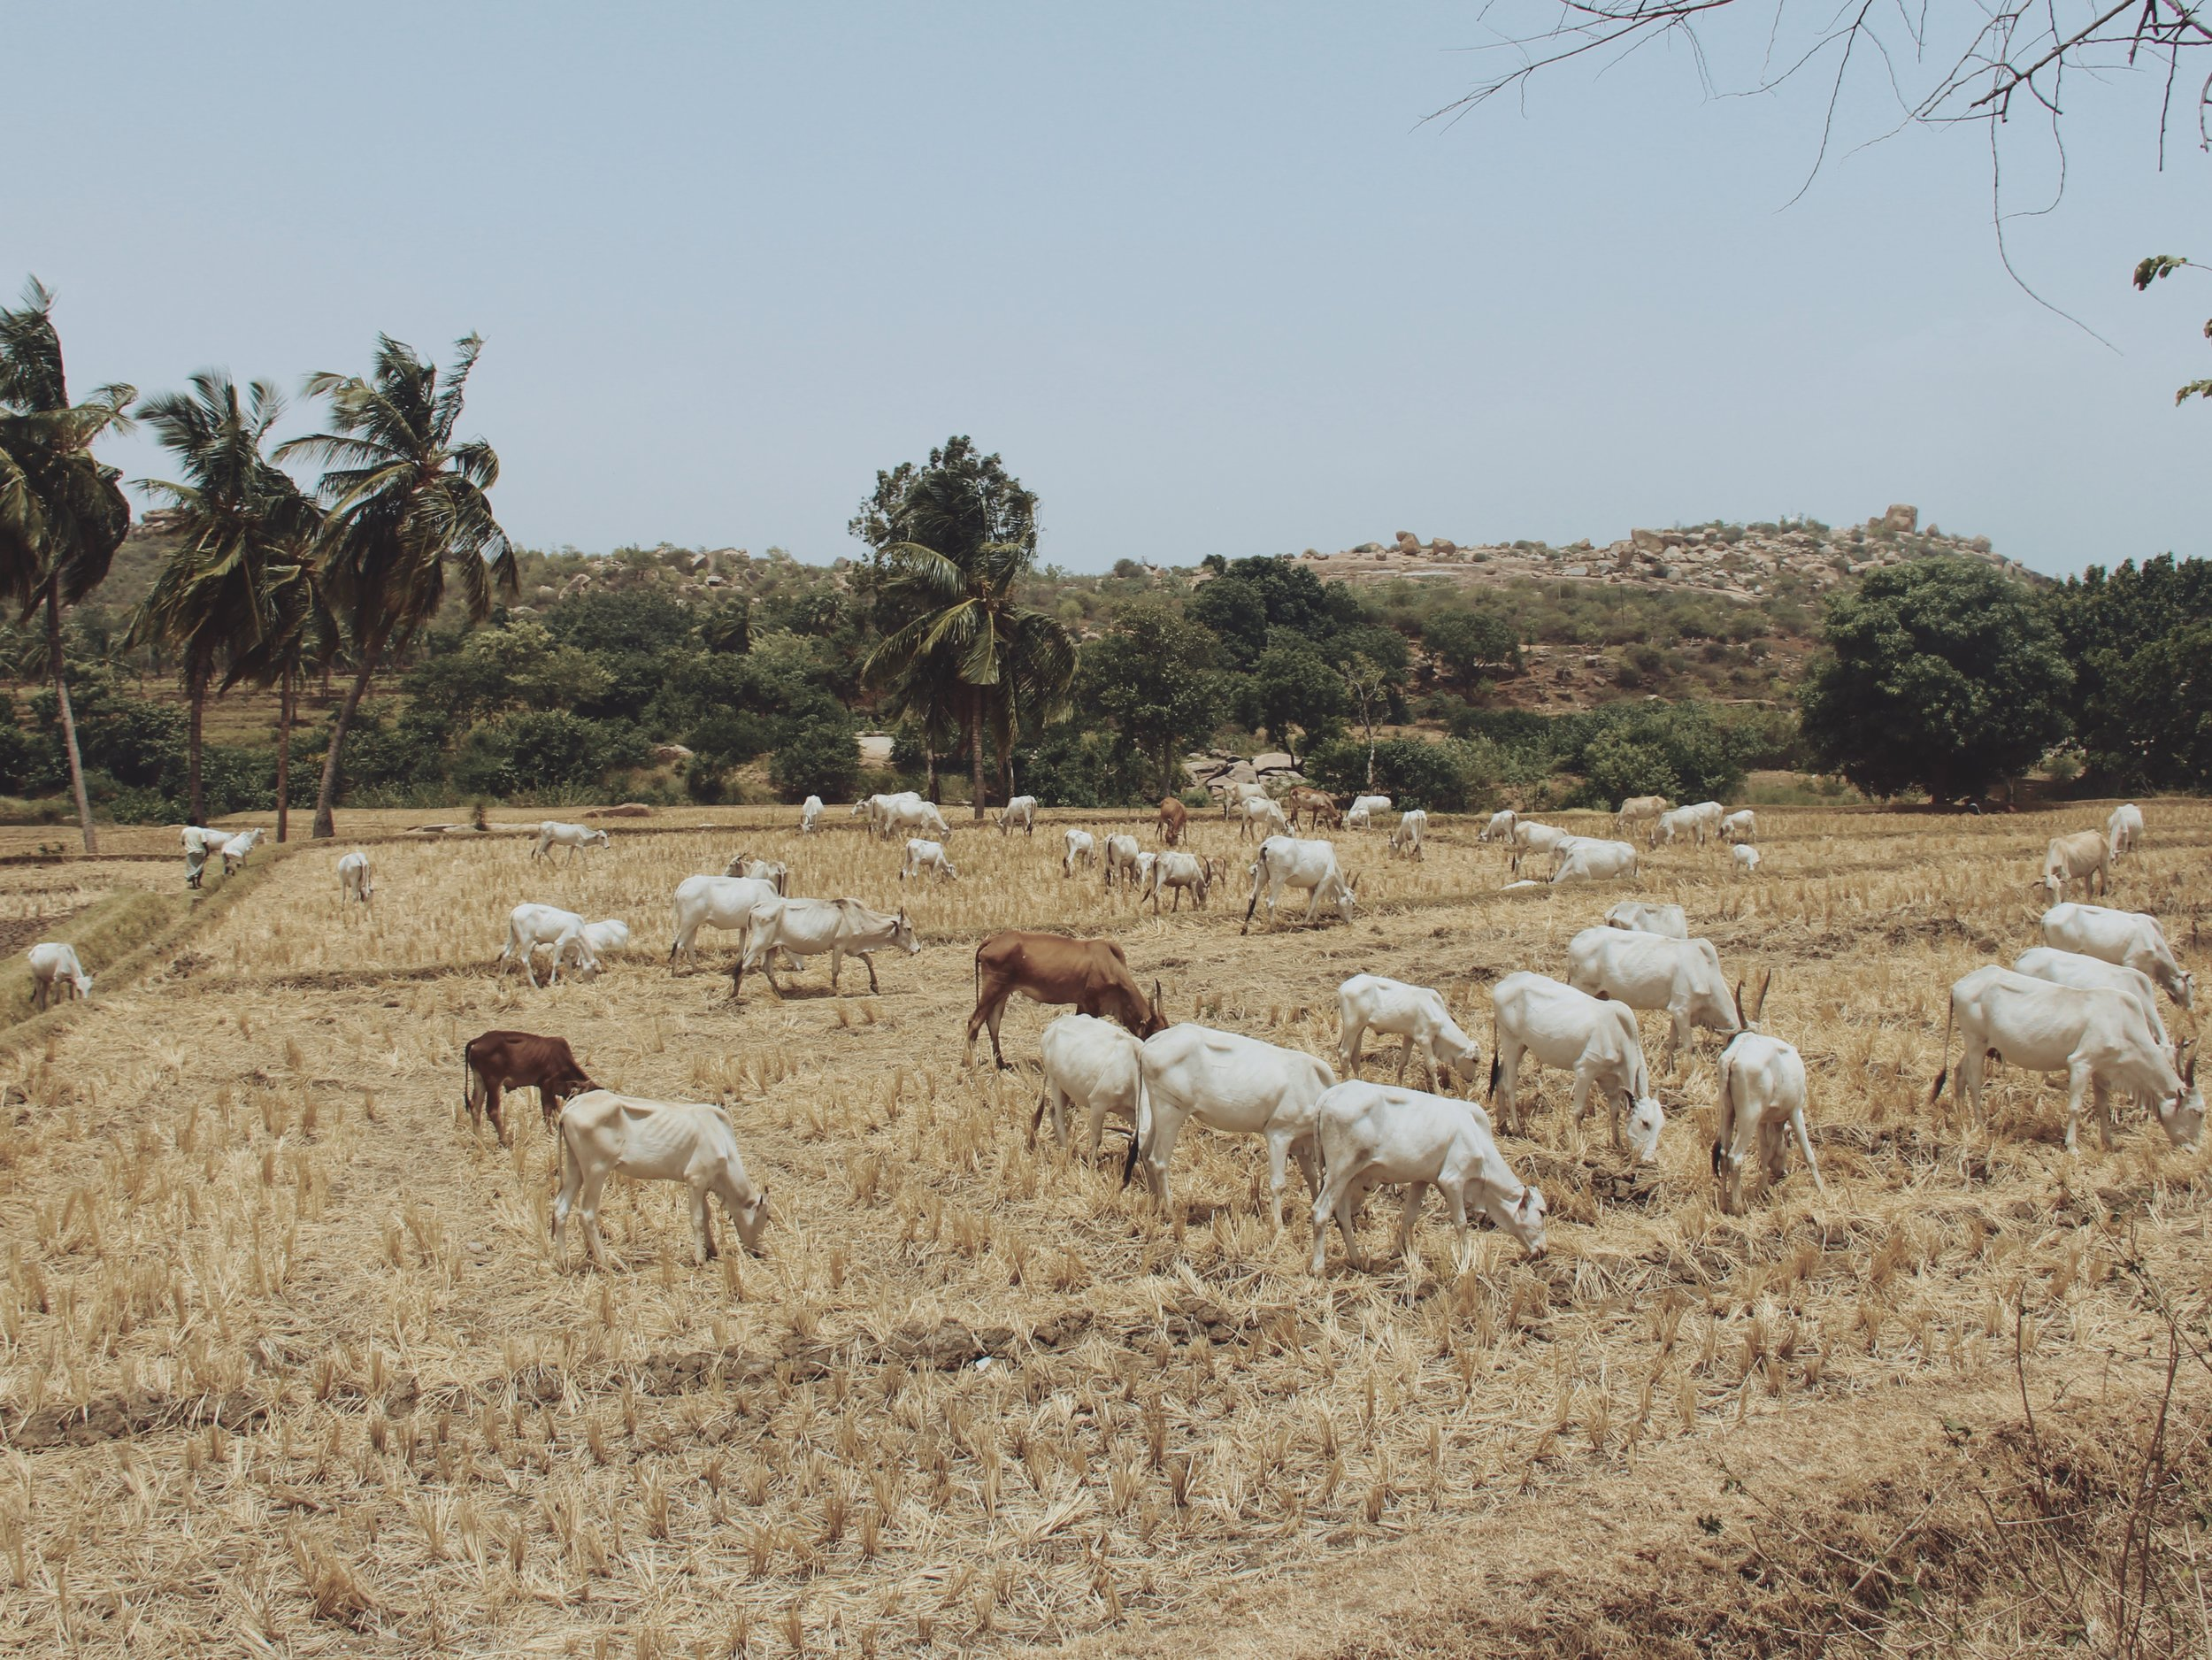 Cows grazing in a field in Hampi.